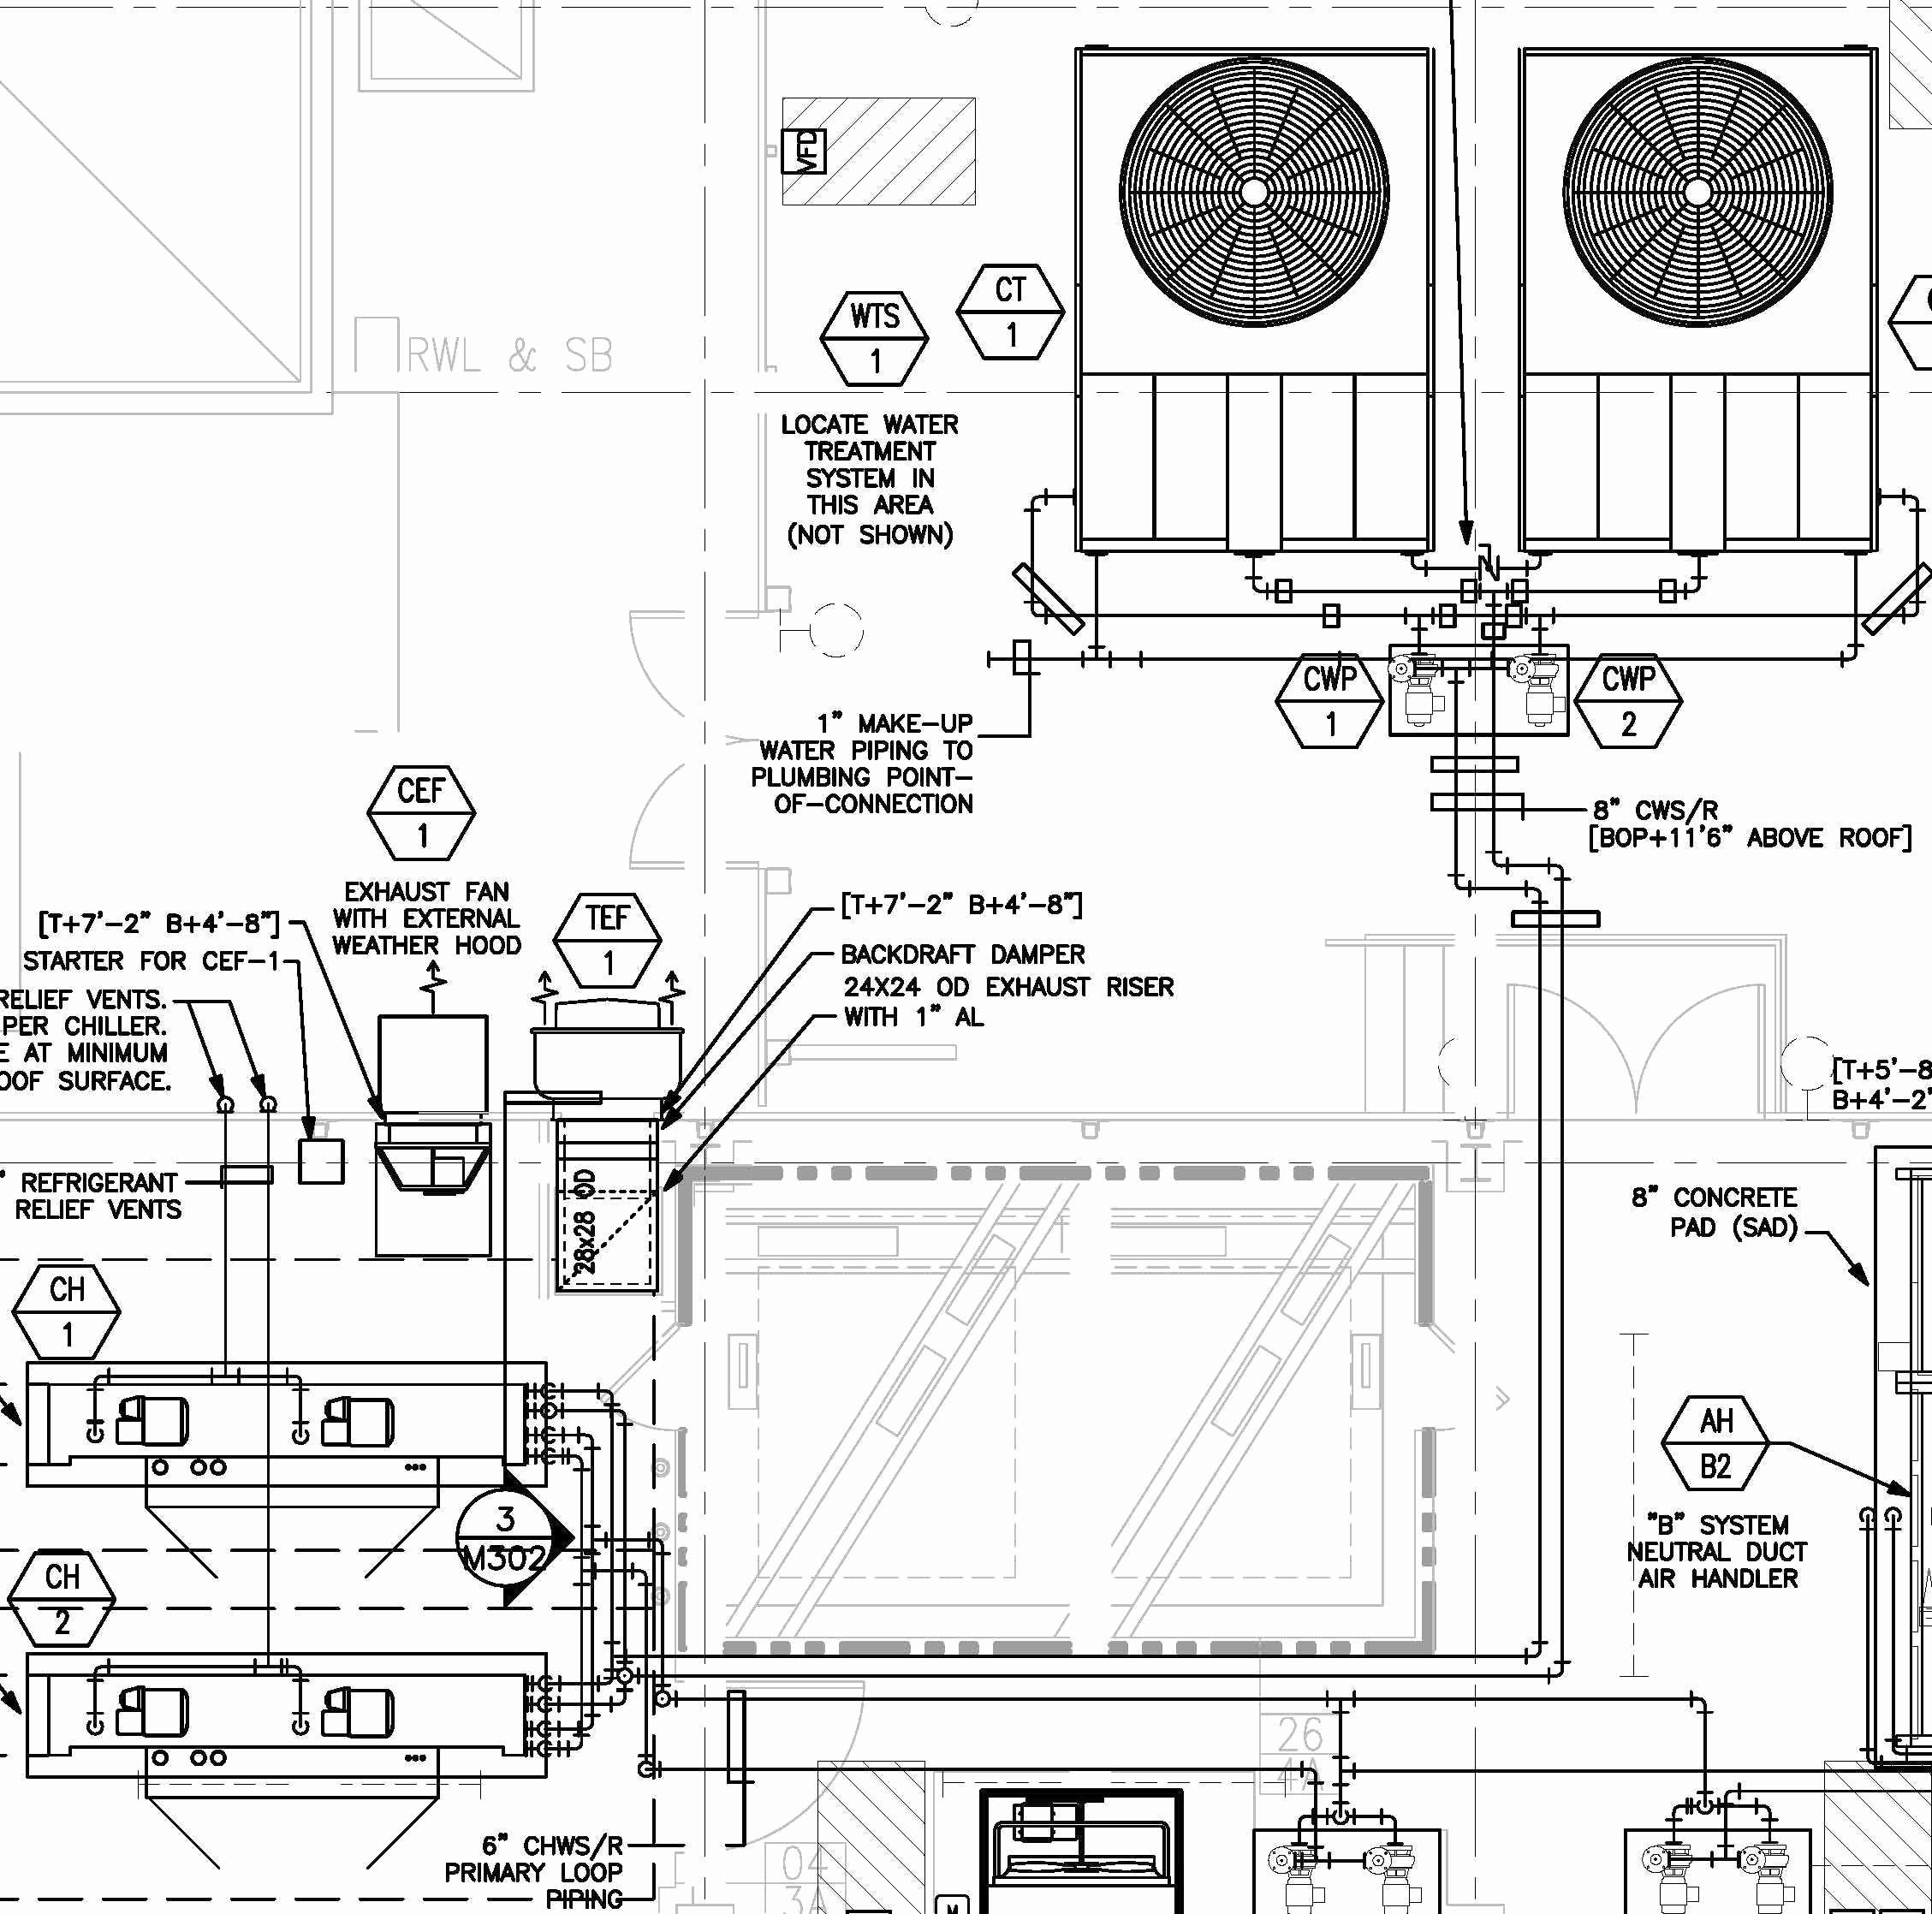 Freightliner Starter Solenoid Wiring Diagram | Wiring Diagram - Freightliner Starter Solenoid Wiring Diagram